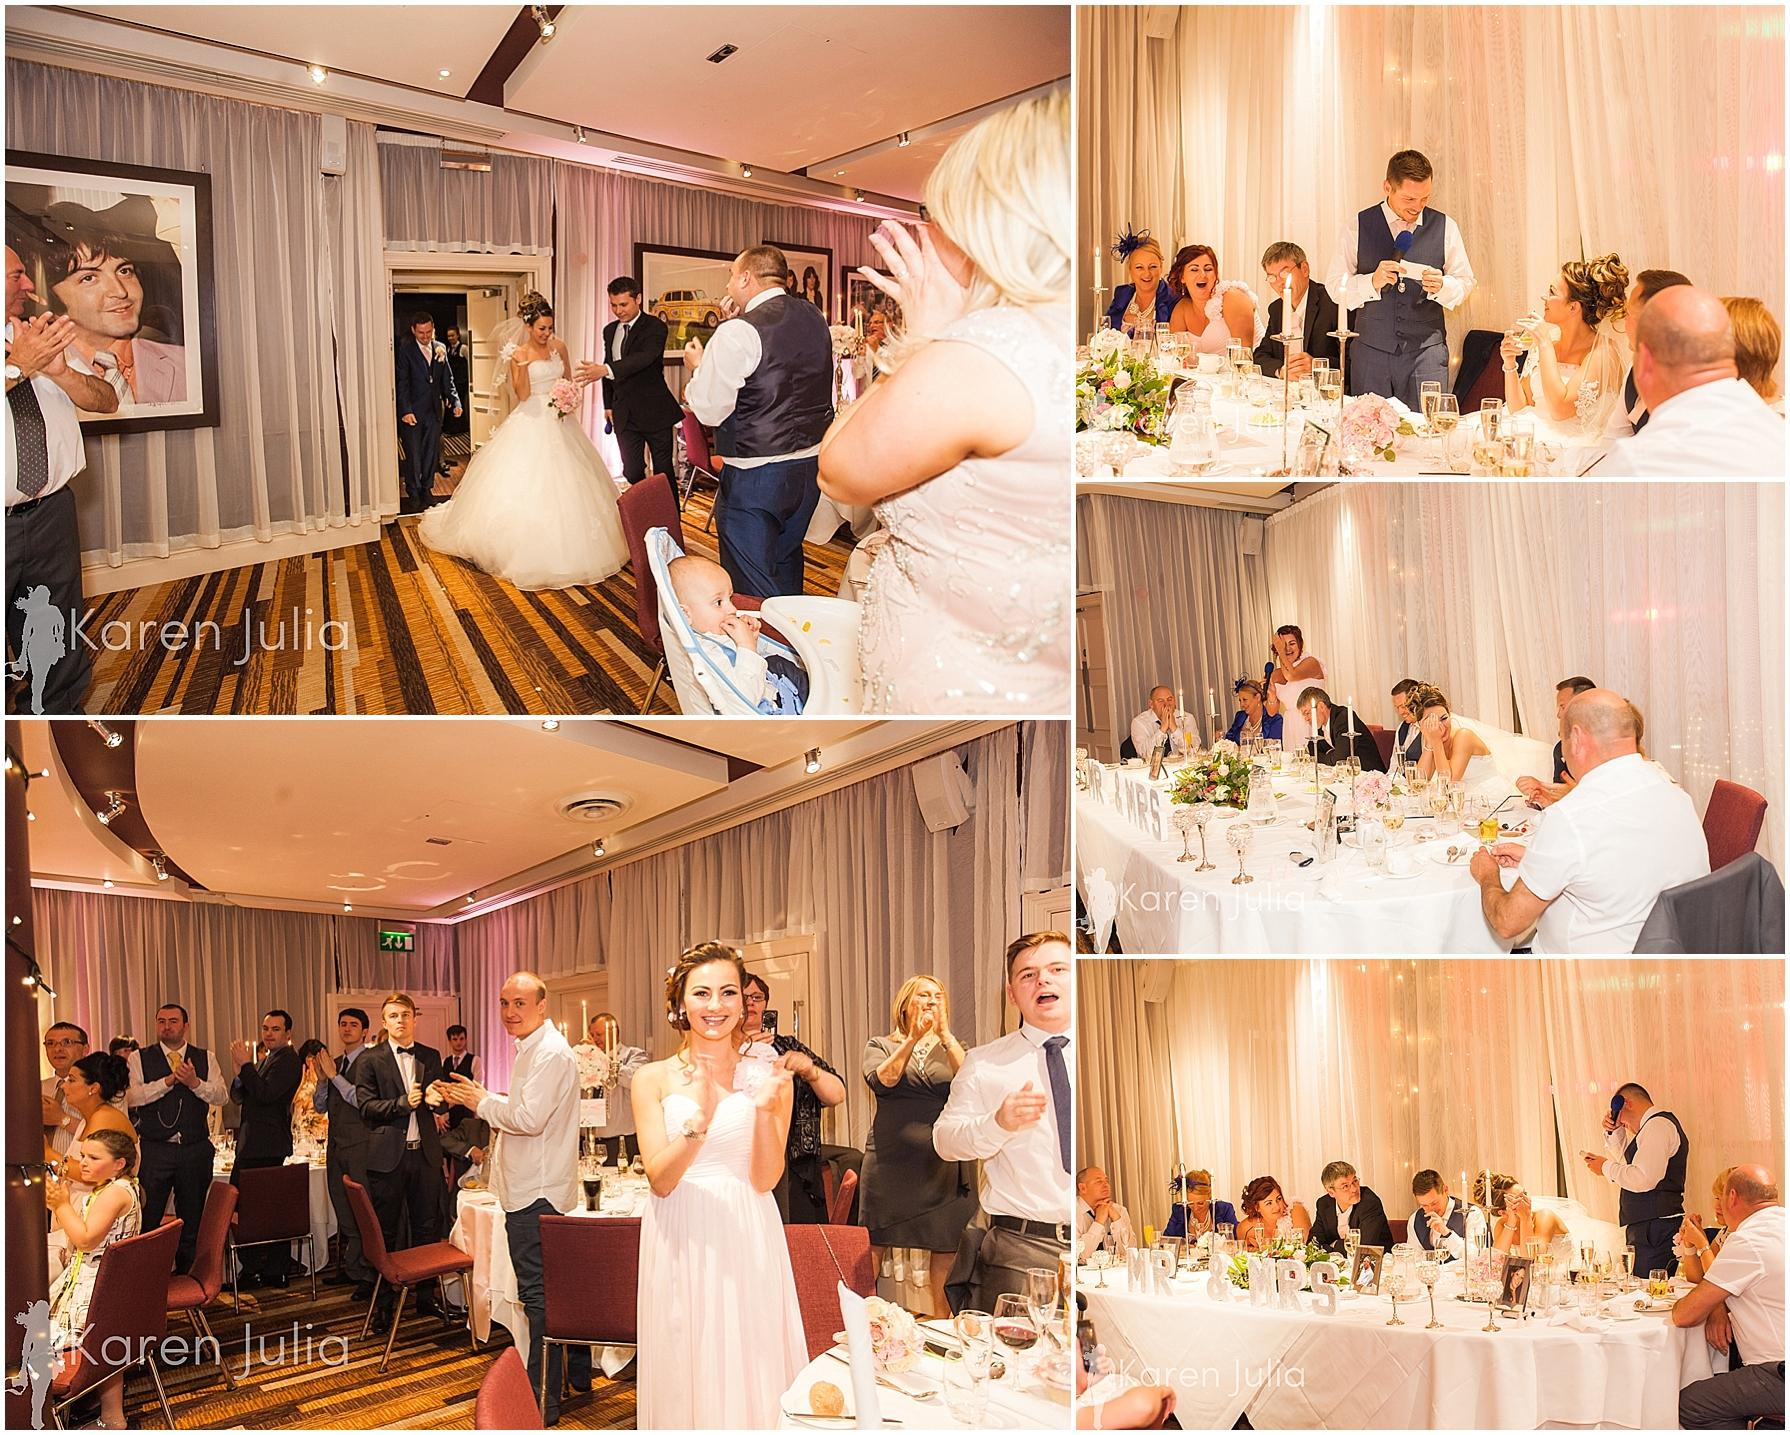 Zygmant suite wedding reception